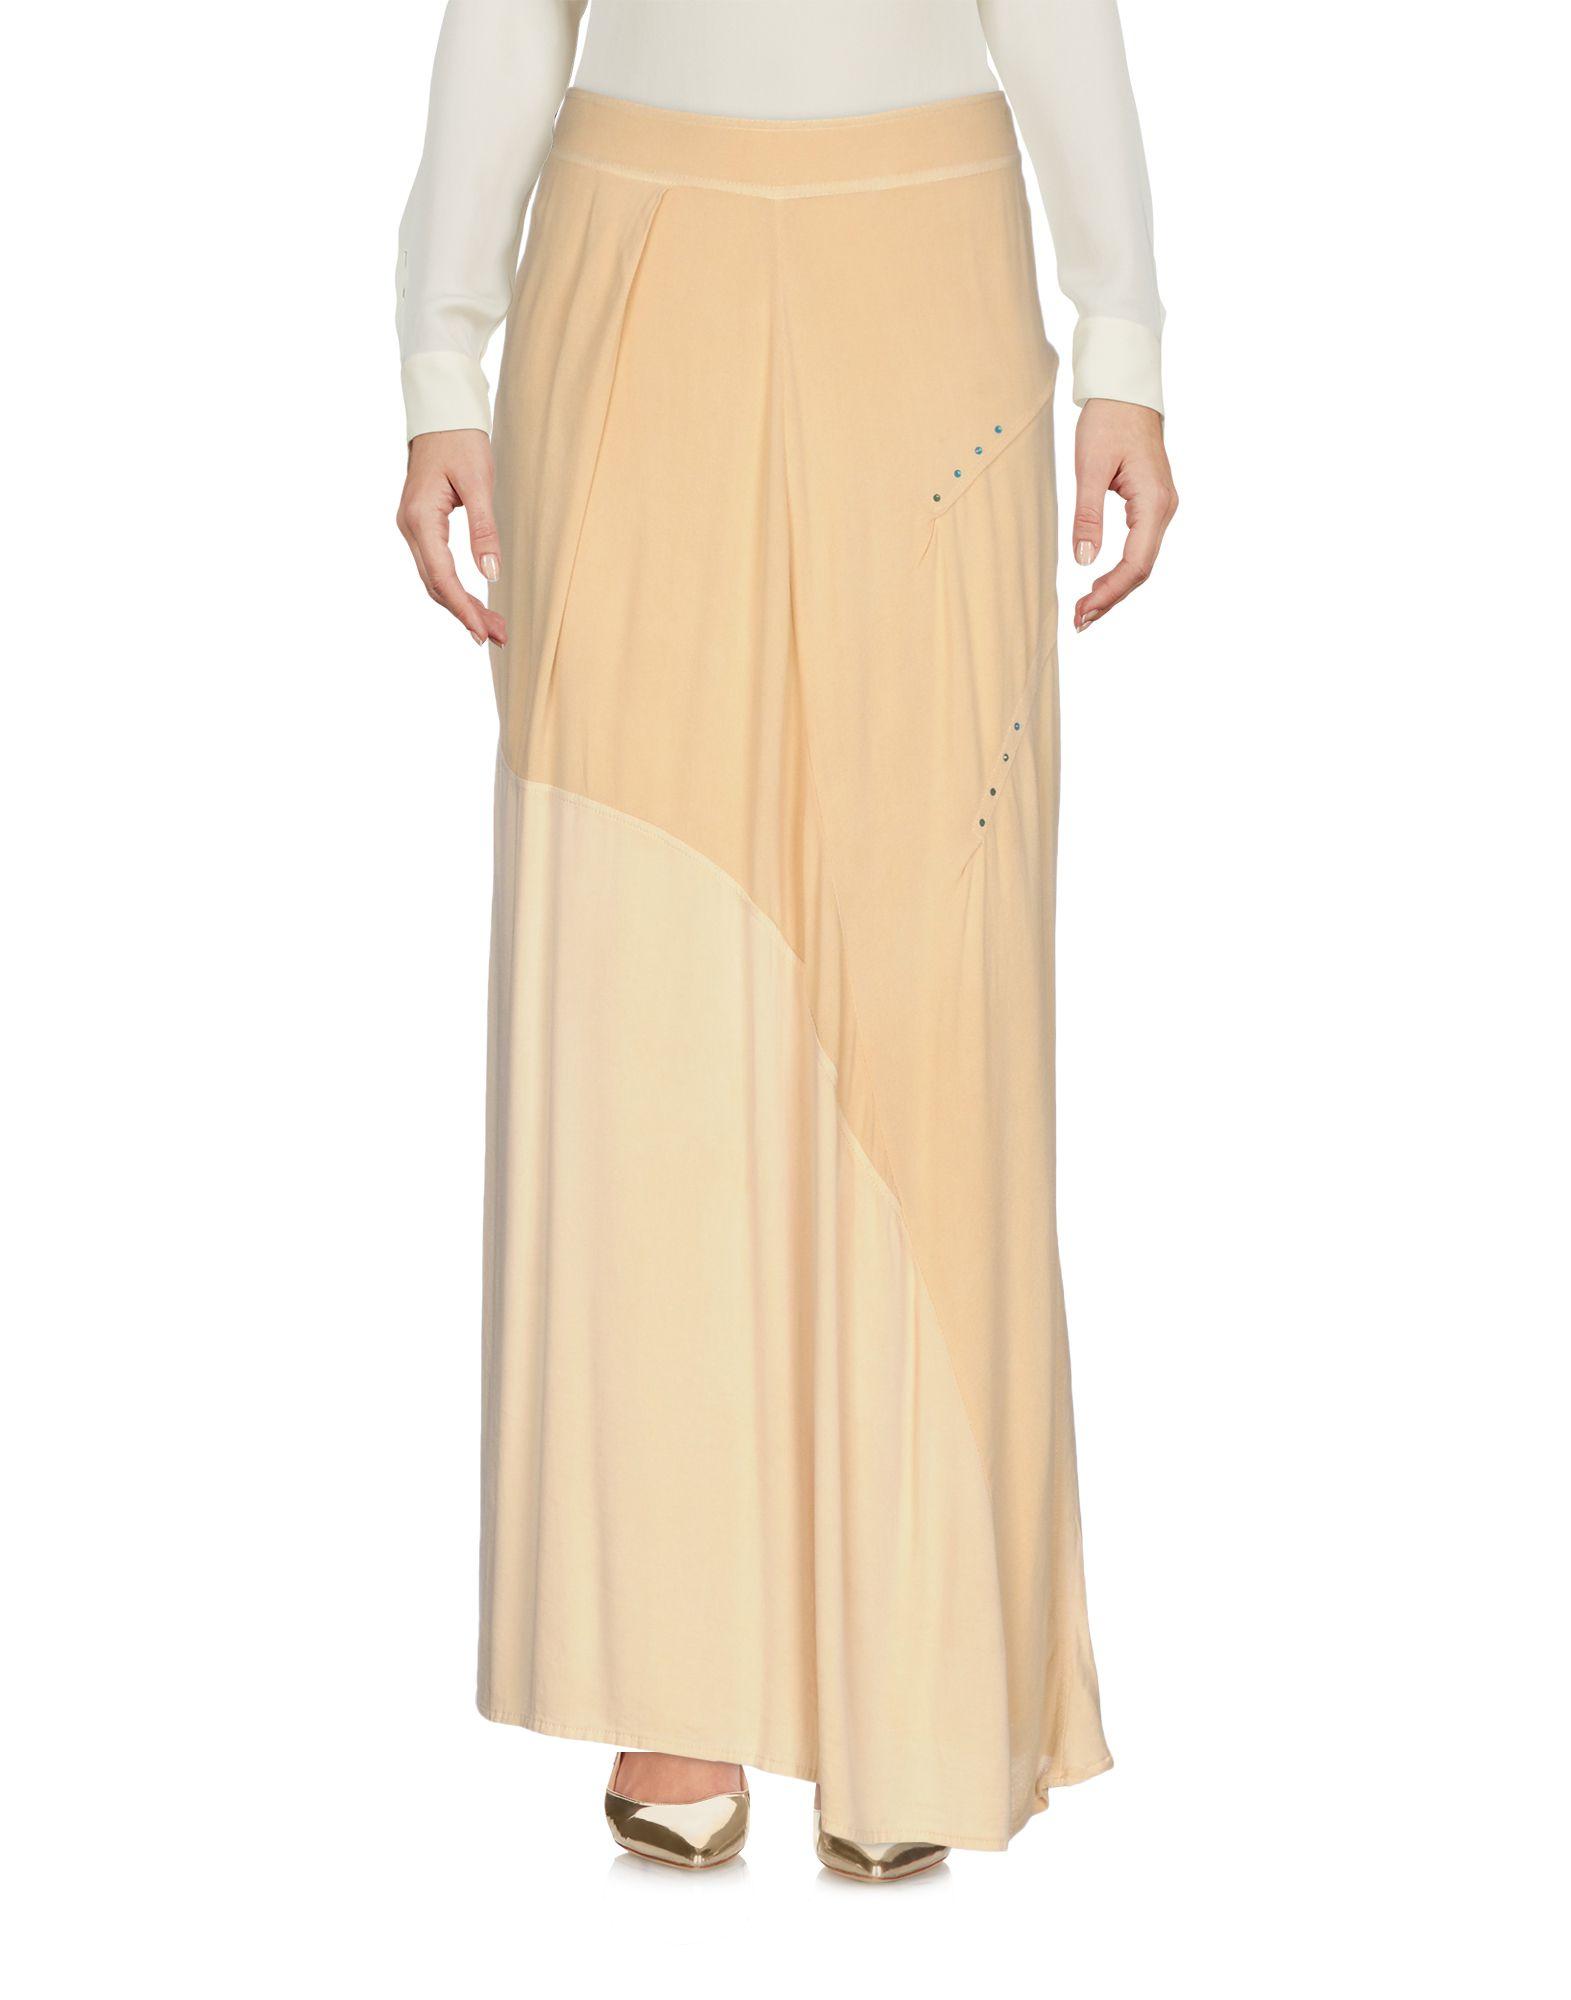 ELISA CAVALETTI by DANIELA DALLAVALLE Длинная юбка daniela drei длинная юбка